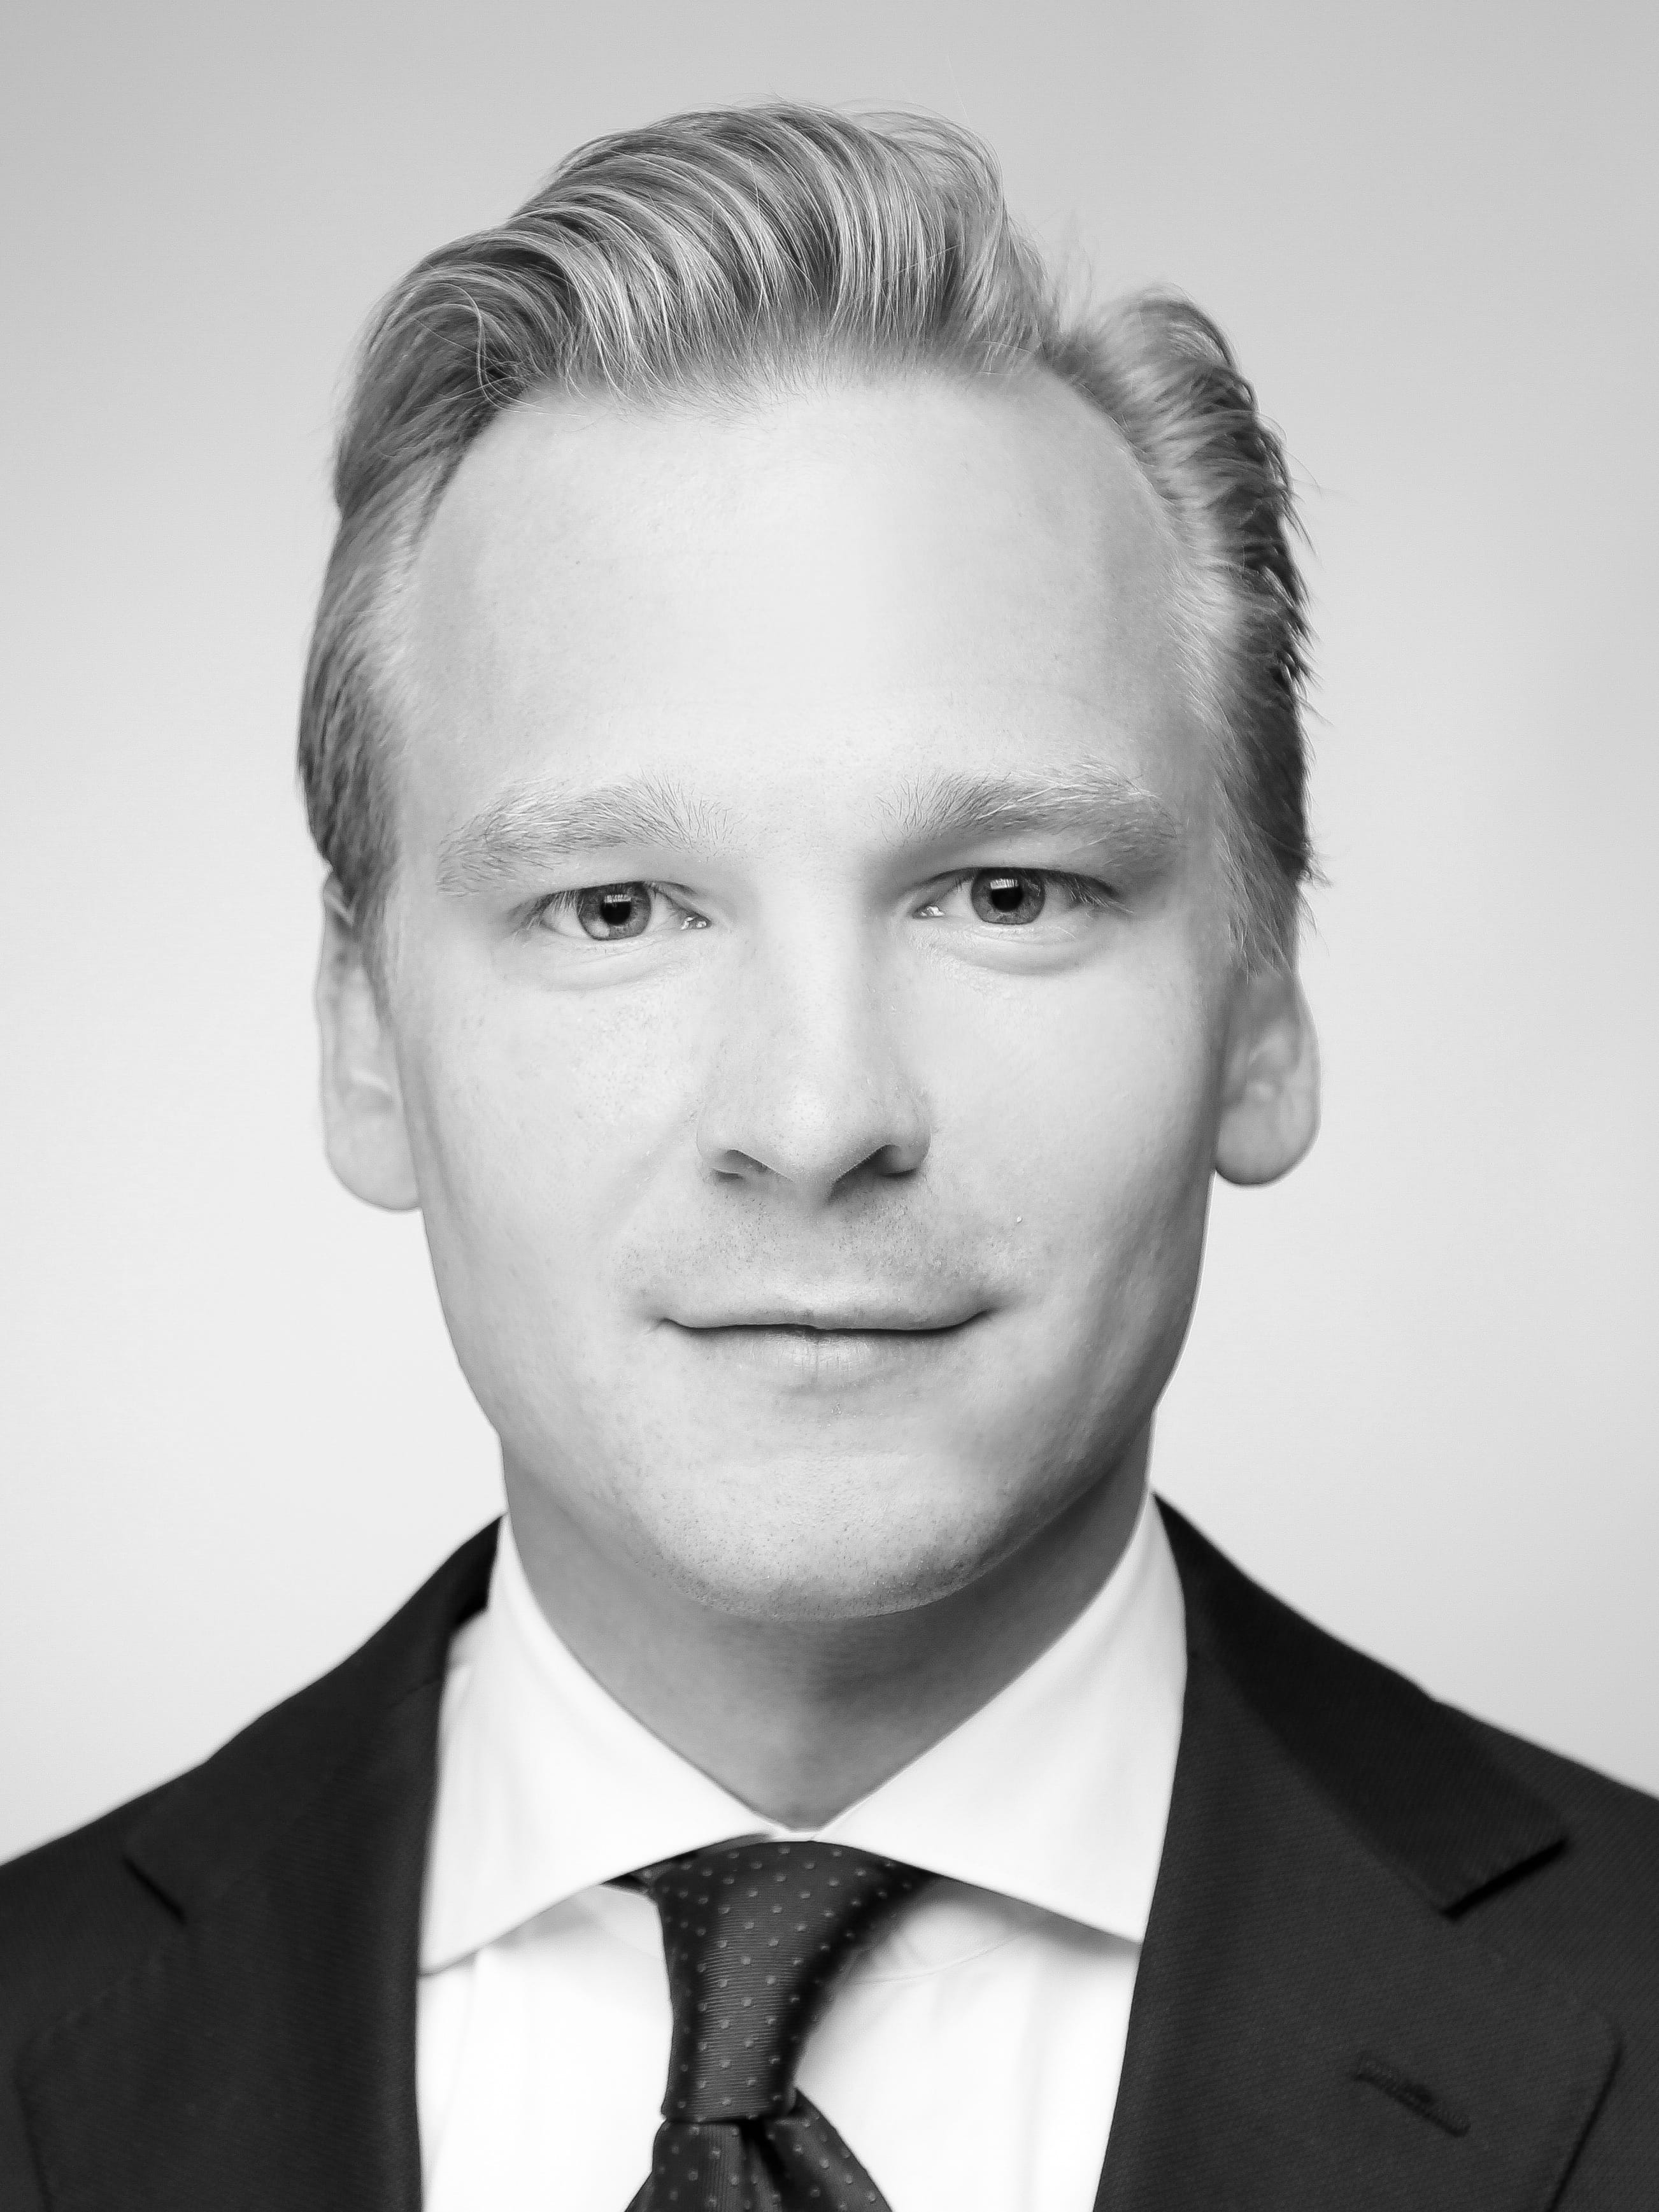 raymond james investment banking